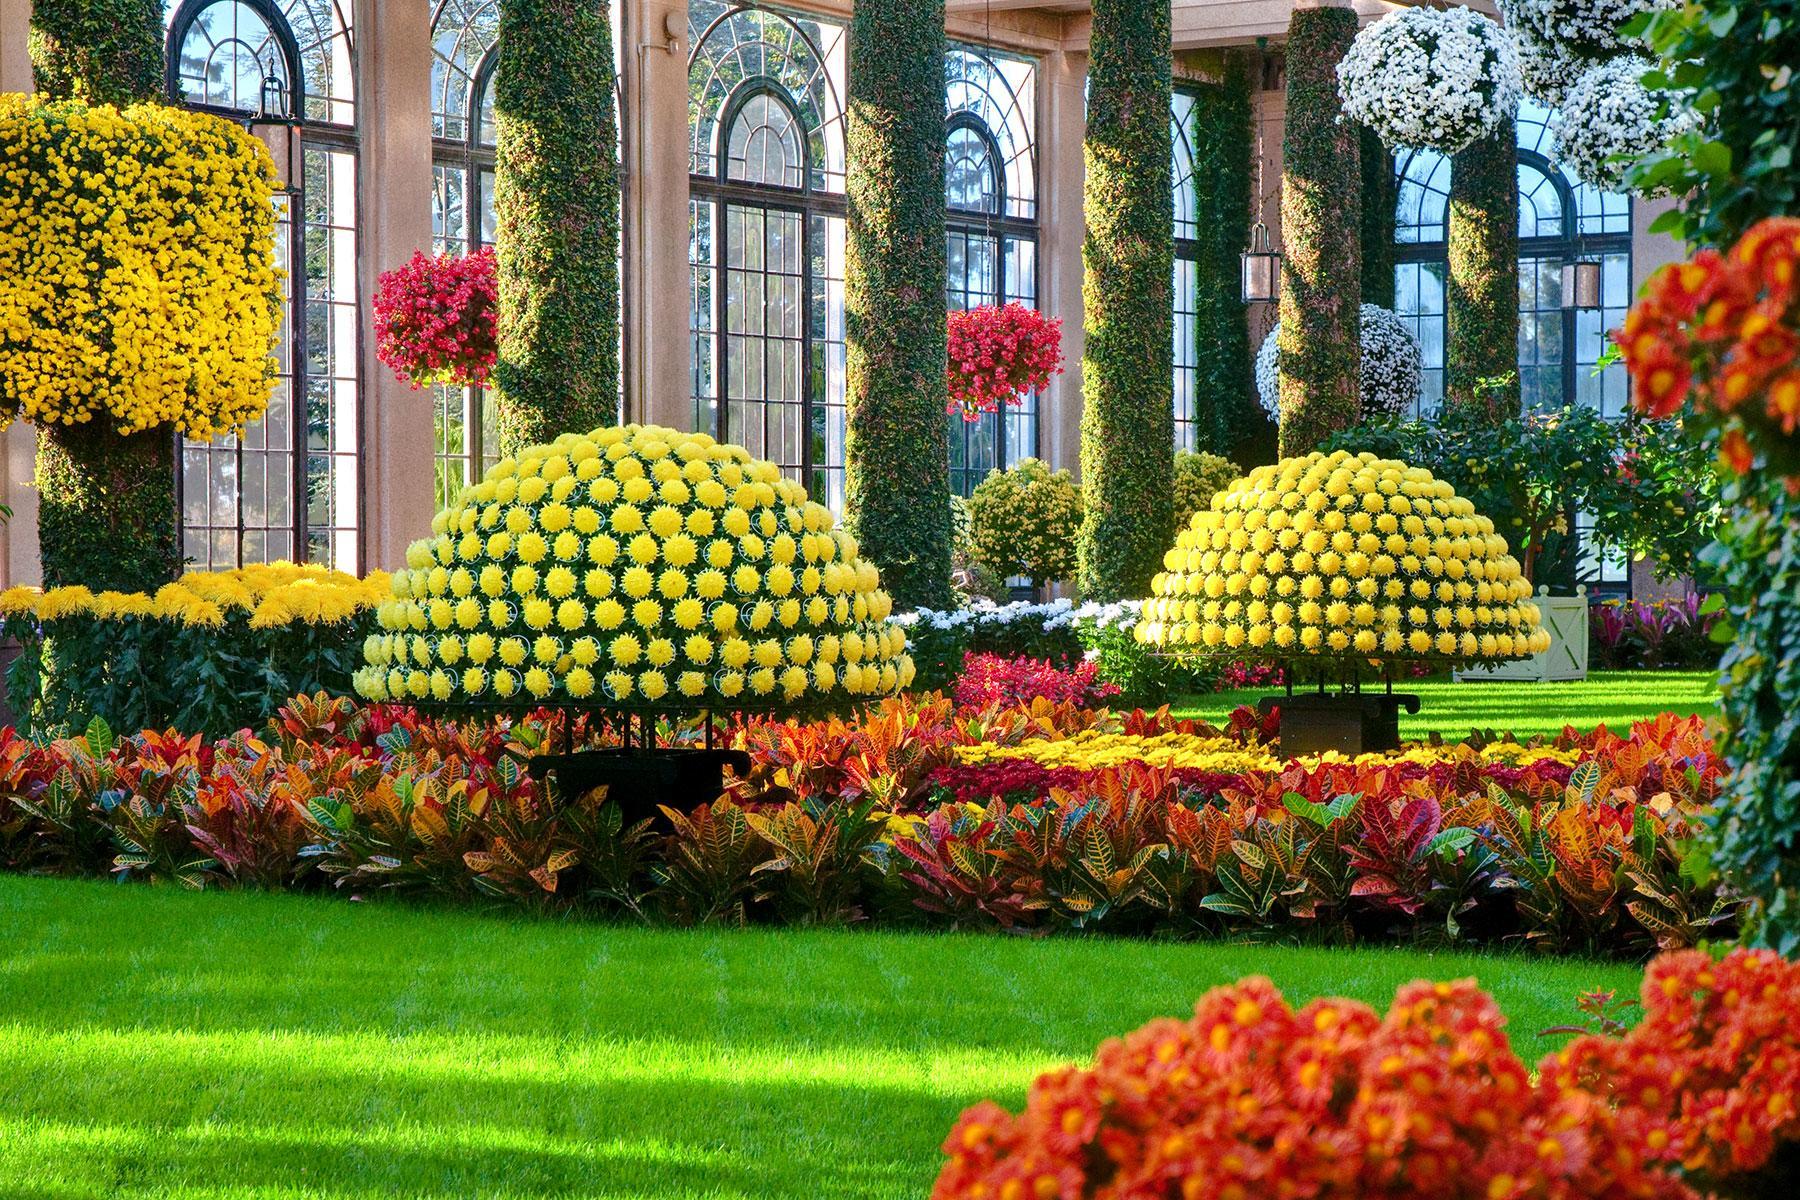 13 festivals at botanic gardens 2018 - Dayton home and garden show 2017 ...